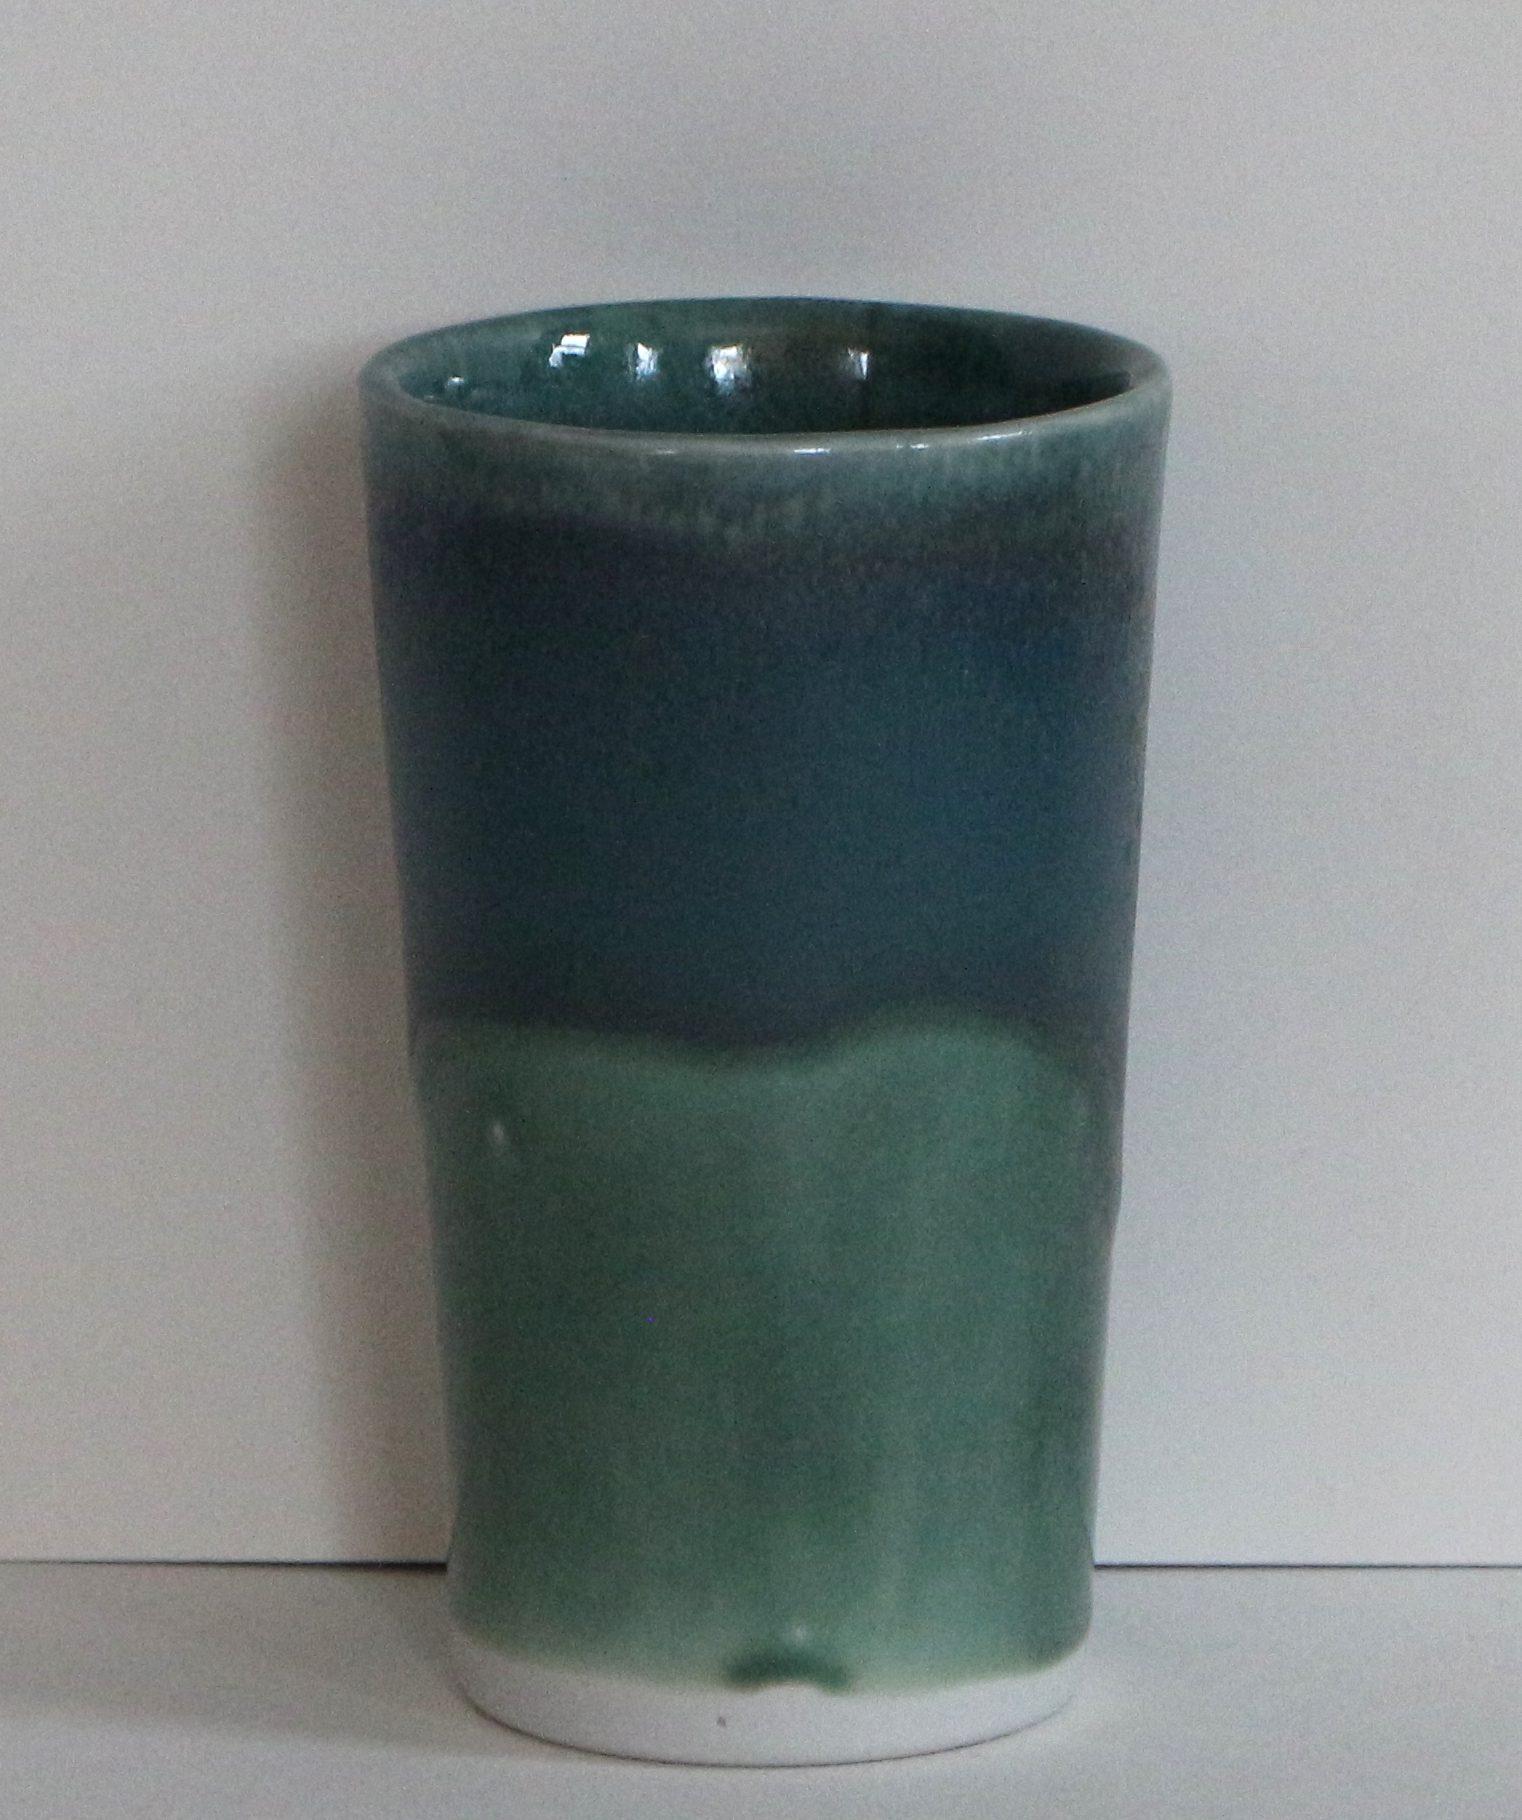 green and blue 14 oz. porcelain tumbler